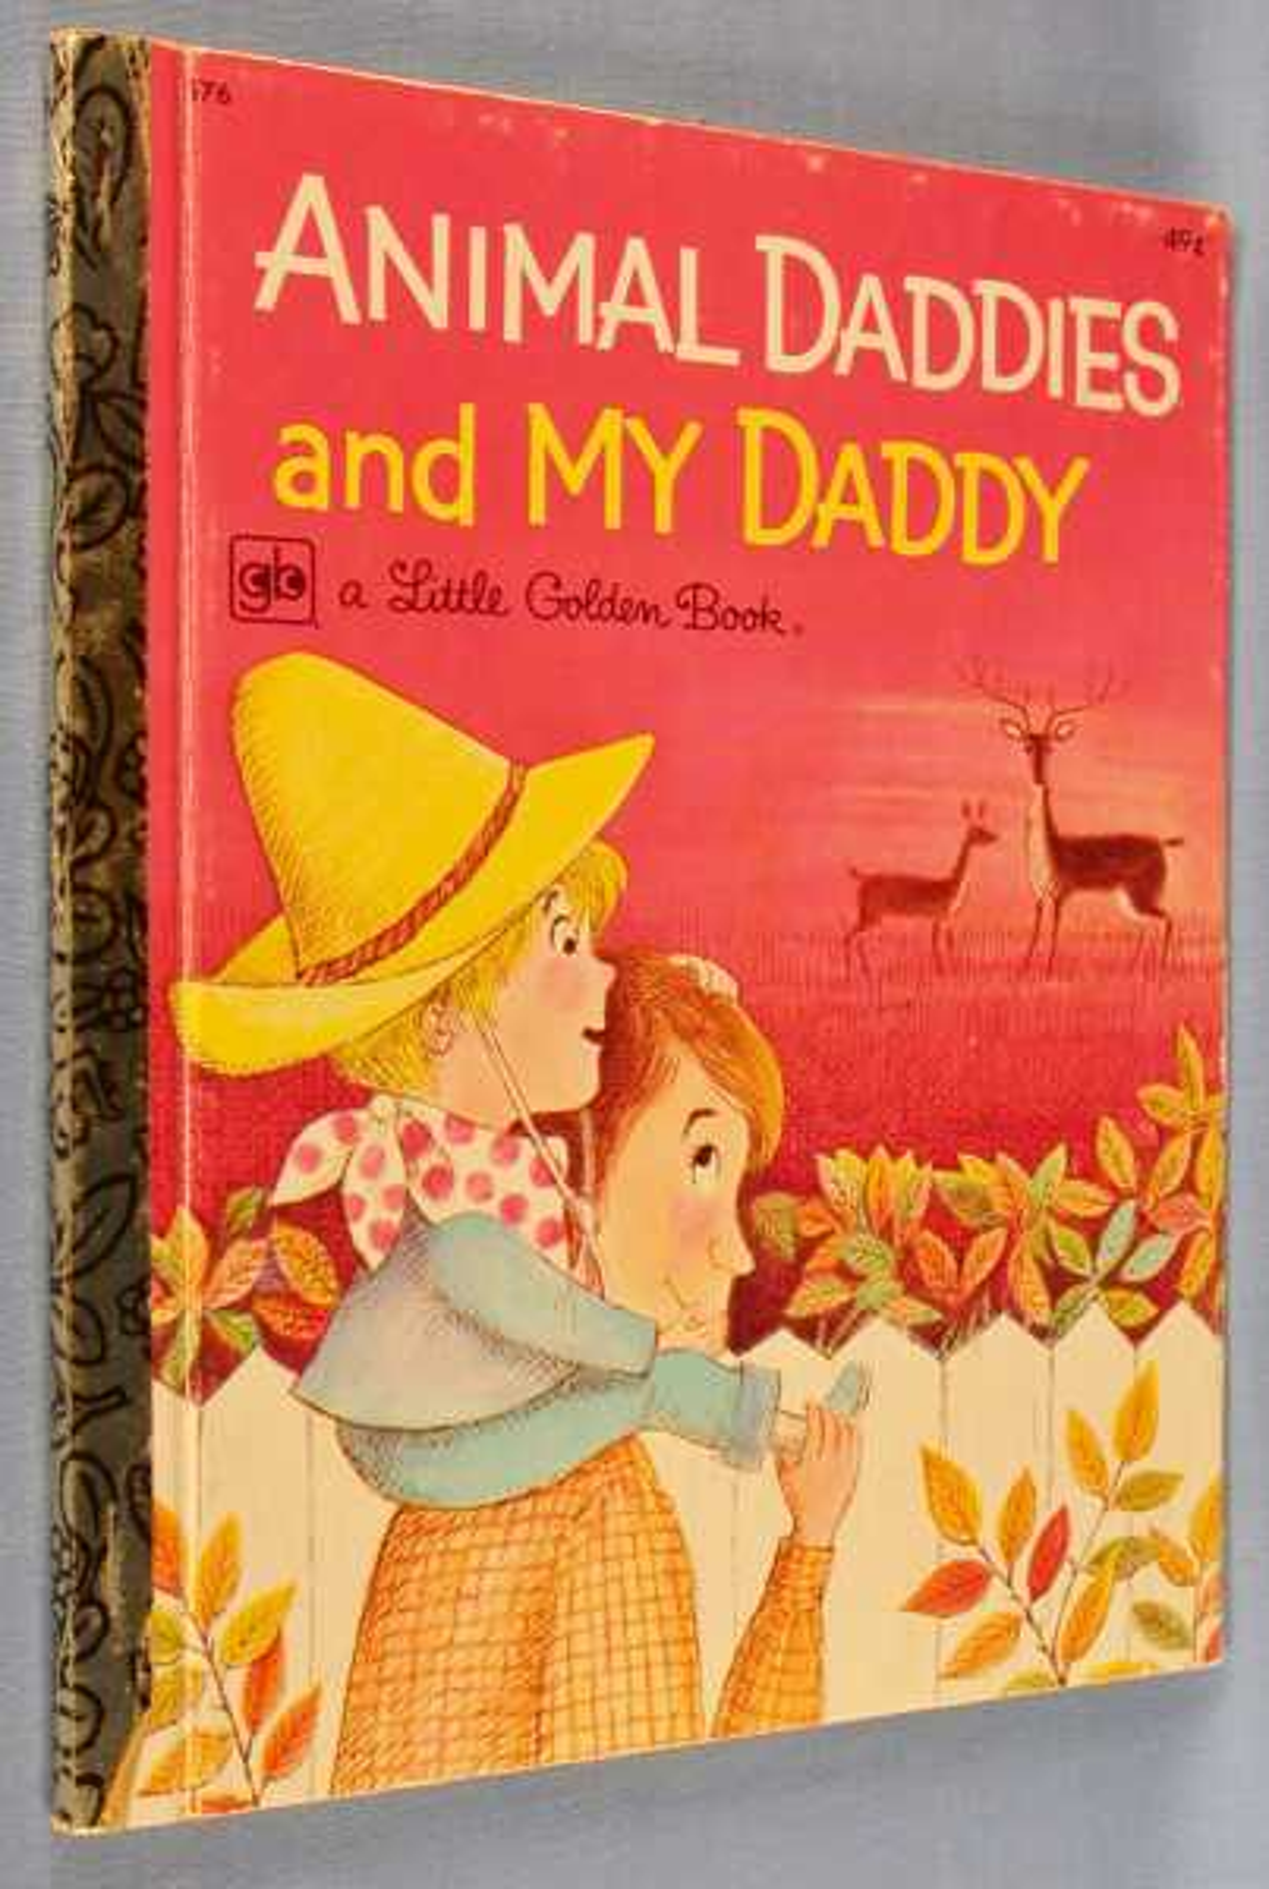 Animal Daddies and My Daddy, Hazen, Barbara Shook